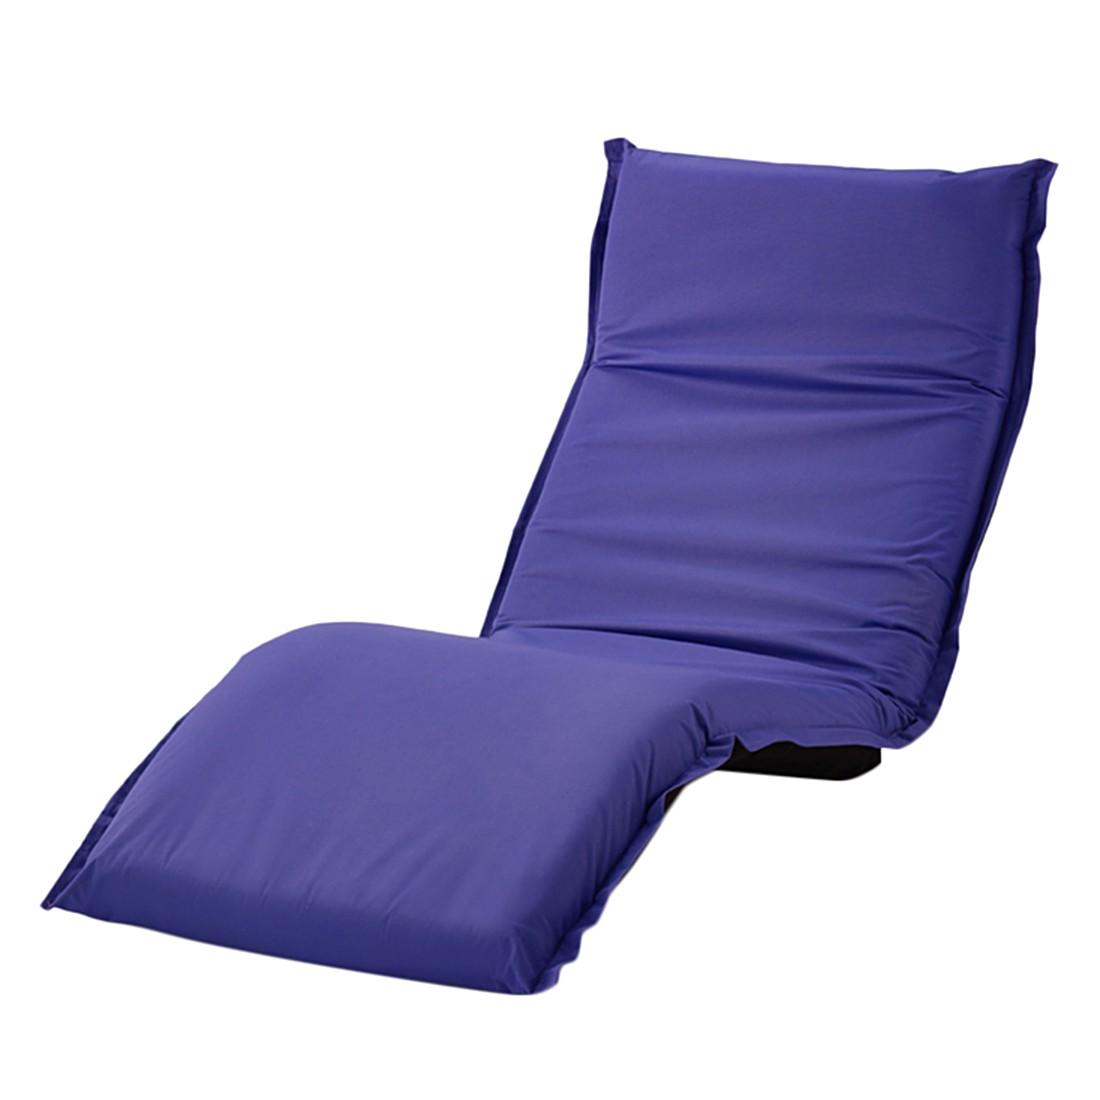 Faltliege Relax – Polyester – dunkellila, PureDay kaufen